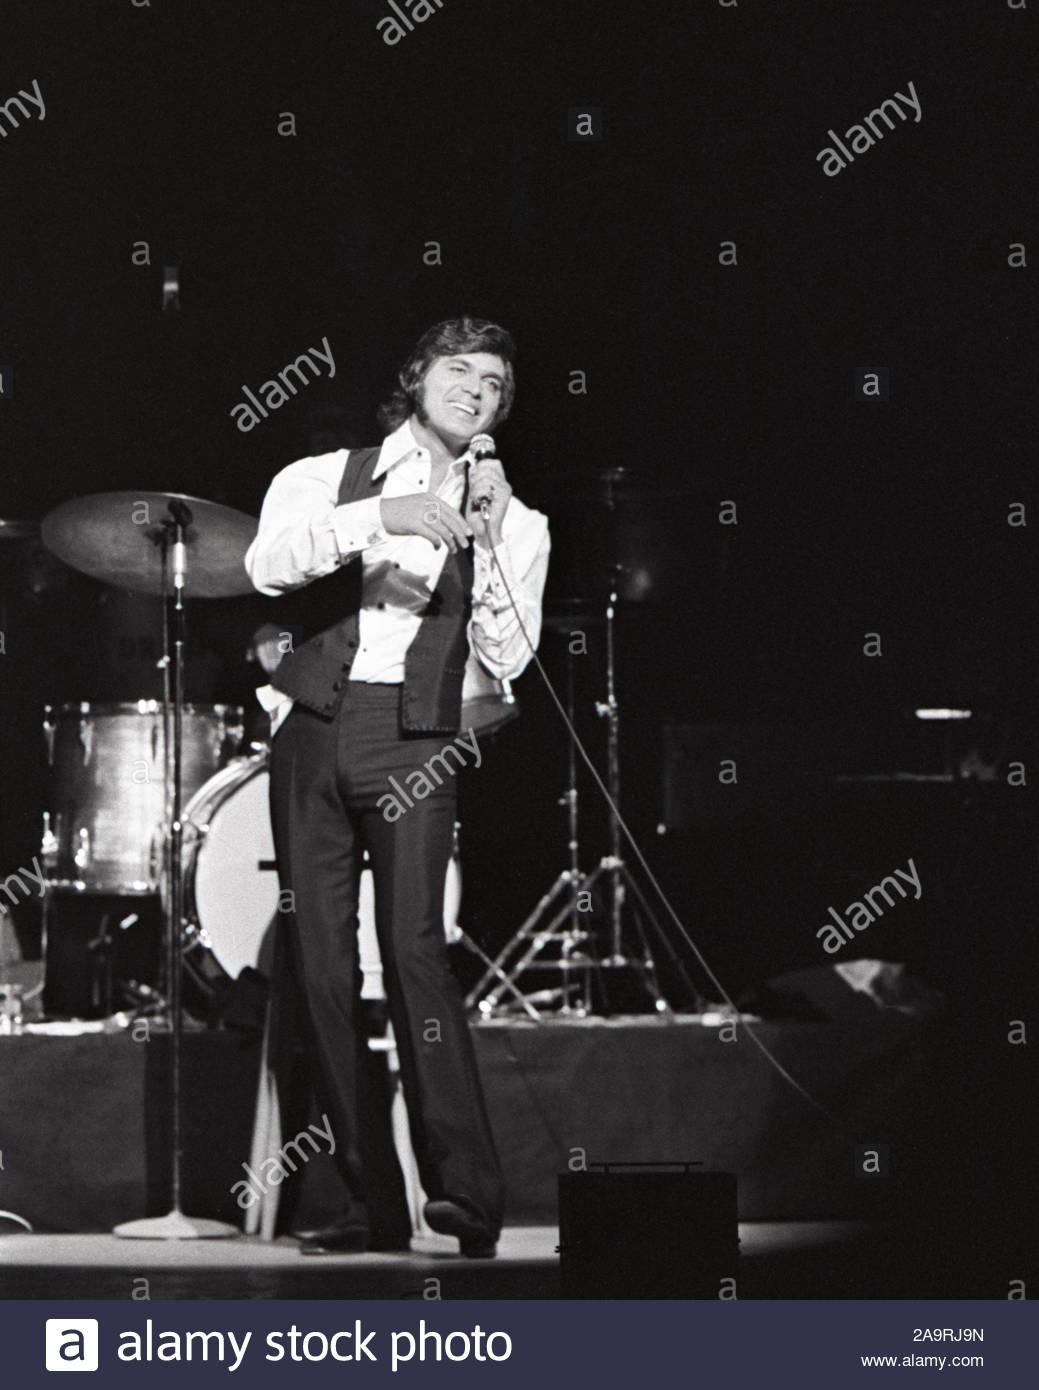 Opening Night ARIE CROWN THEATER Photo 015 1971 Singer ENGELBERT HUMPERDINCK